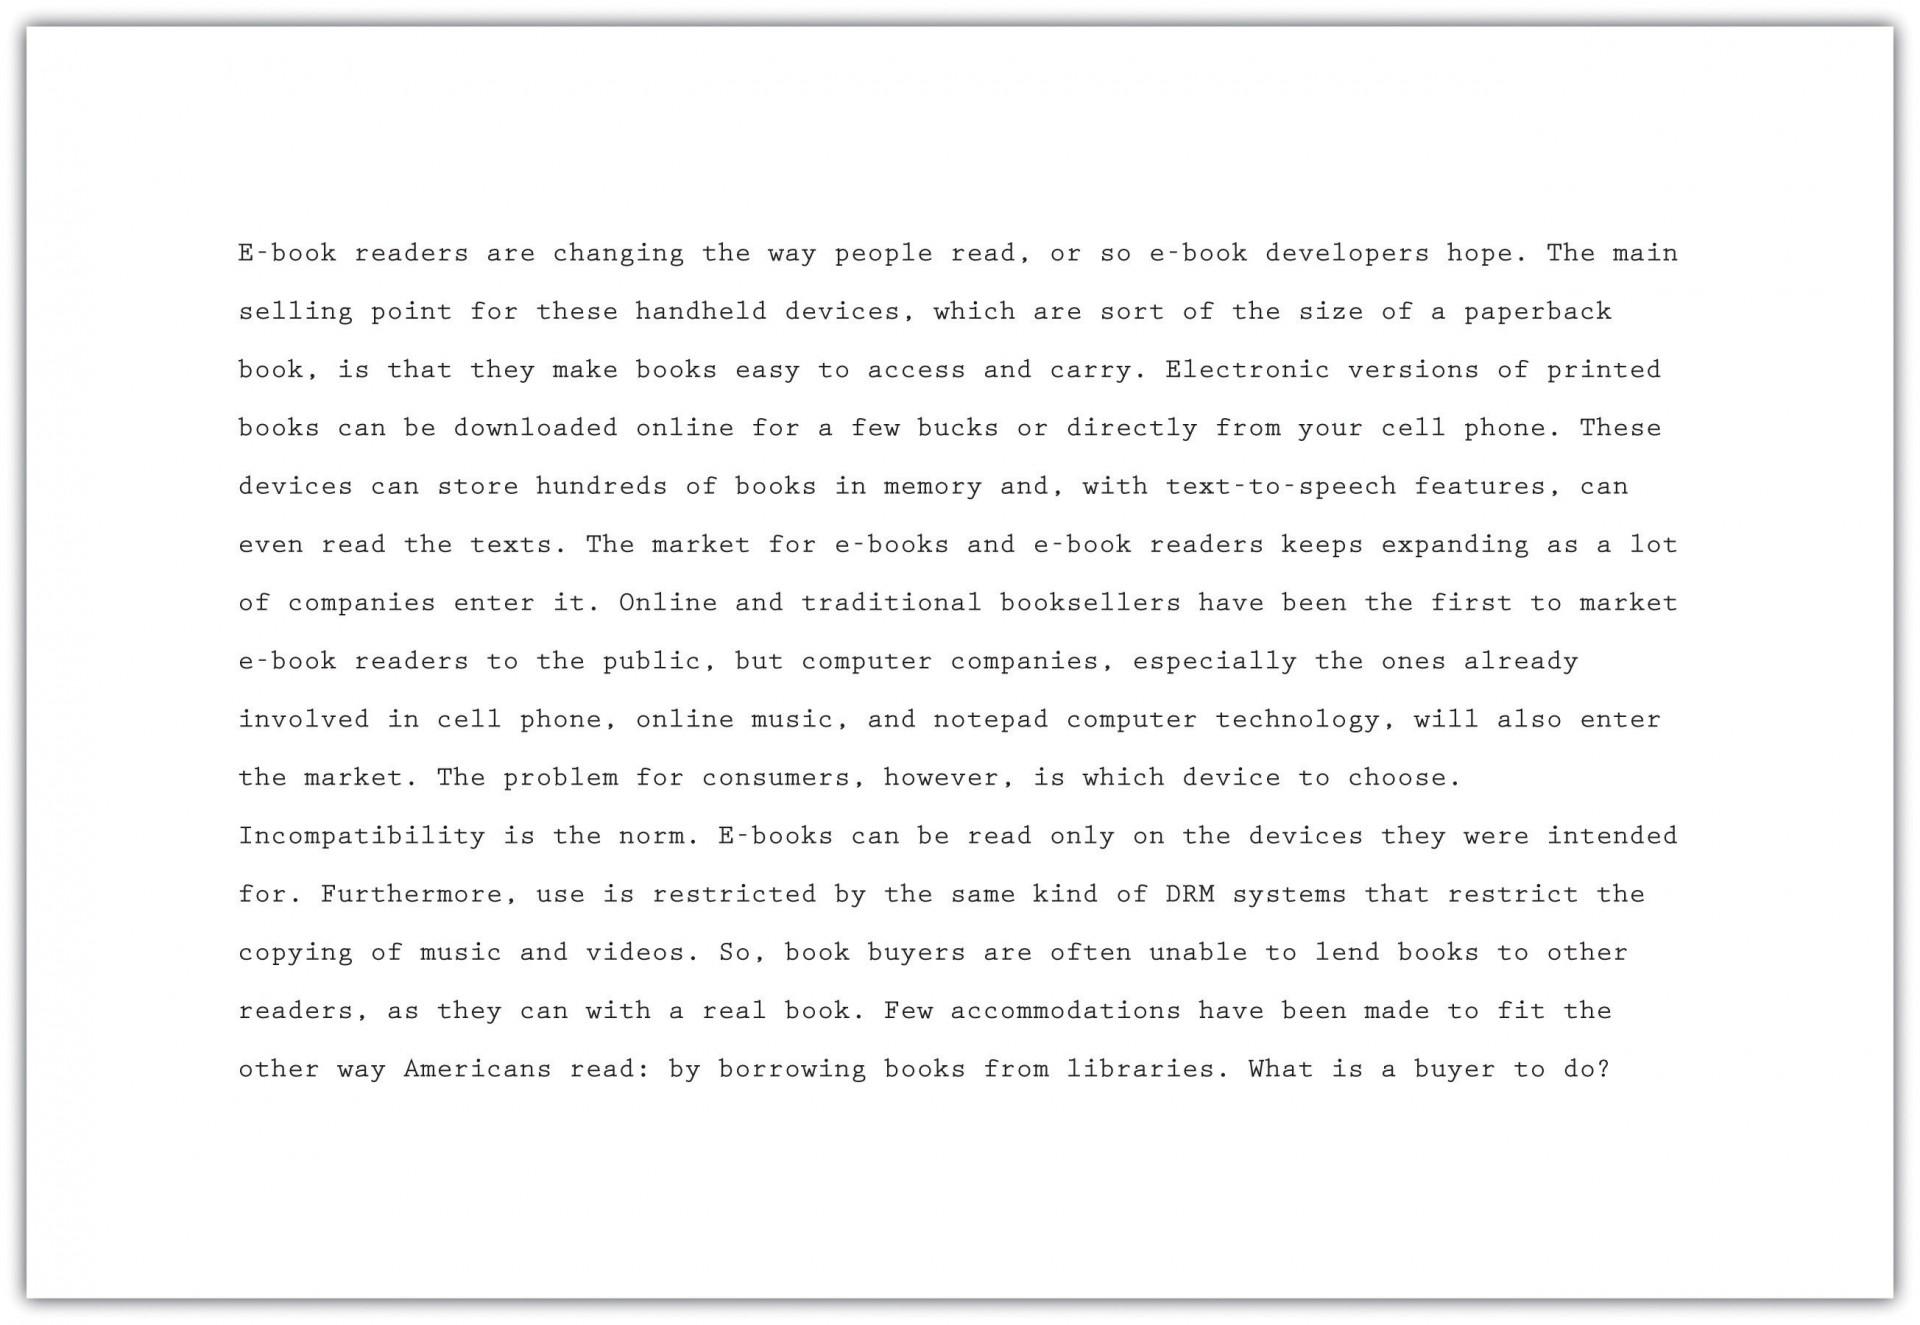 013 Interesting Persuasive Essay Topics Unforgettable Argumentative For High School Students Funny Speech 1920